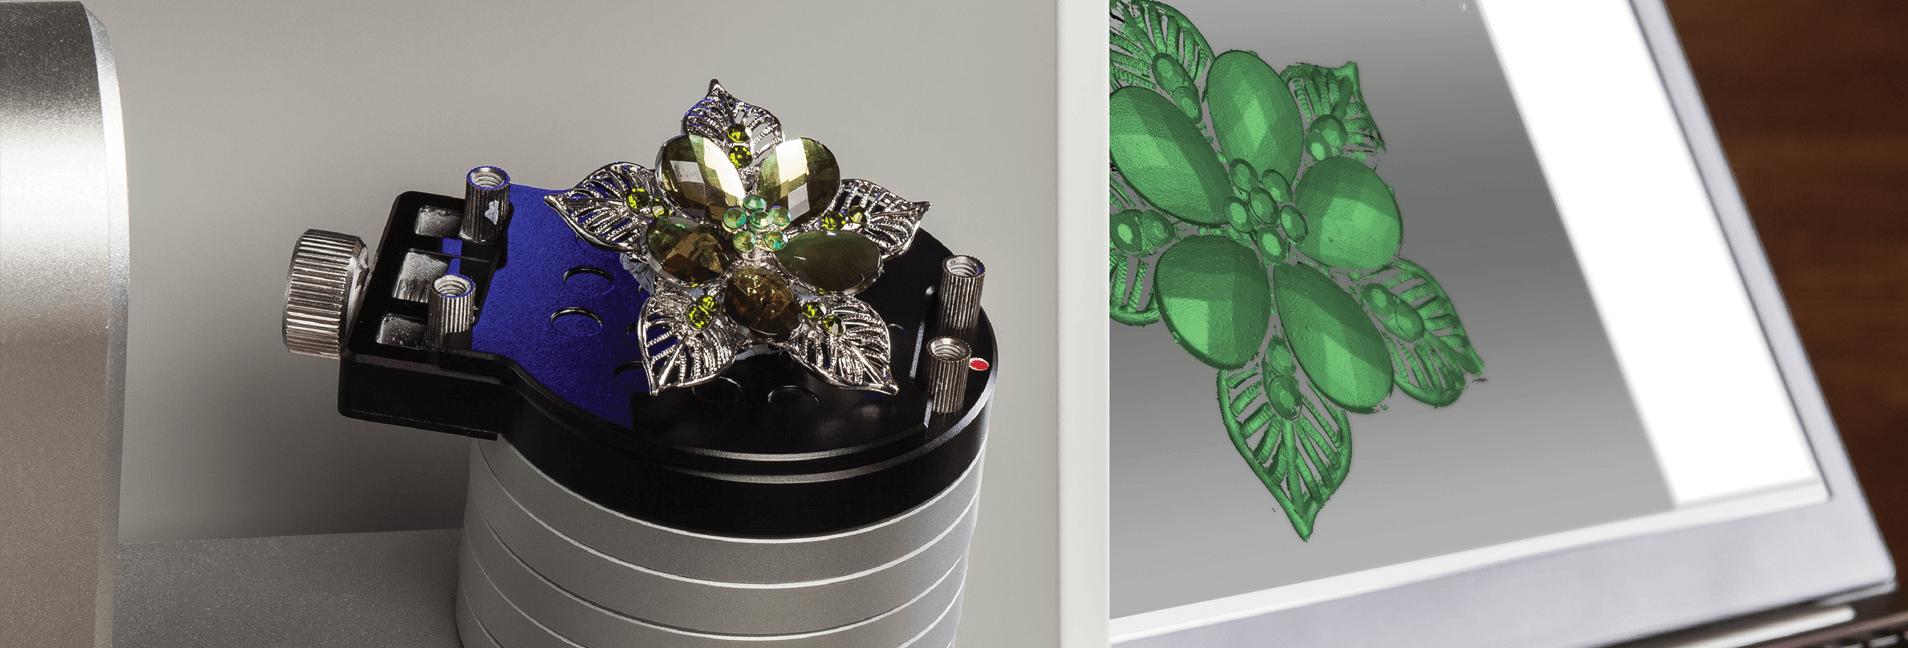 Micro - Skaner 3D firmy Artec